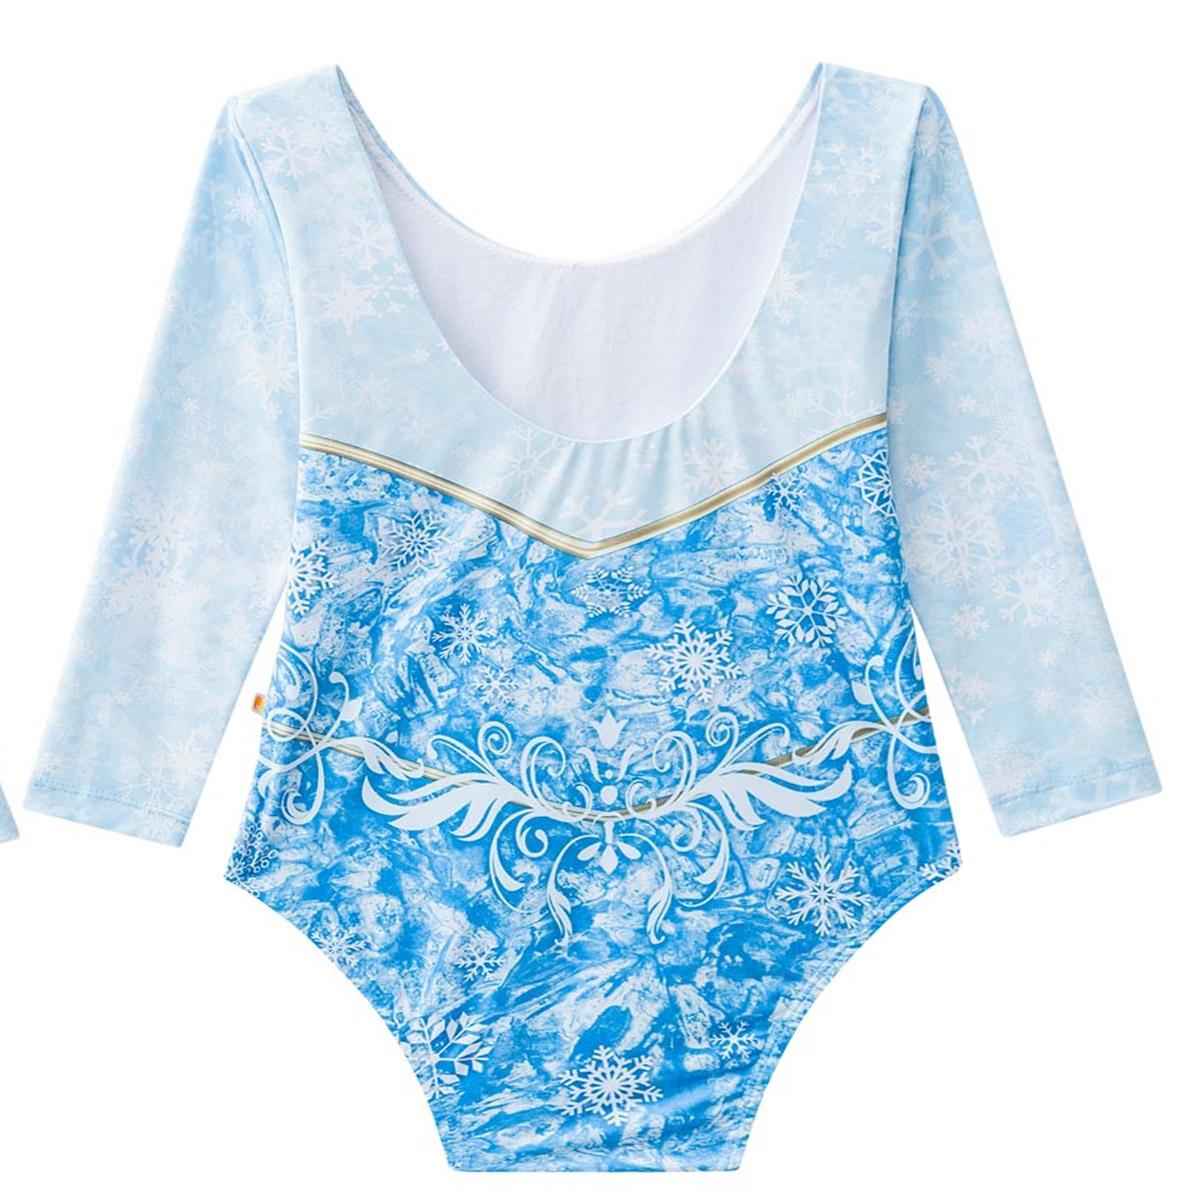 Biquíni maiô infantil frozen elsa azul gelo manga longa